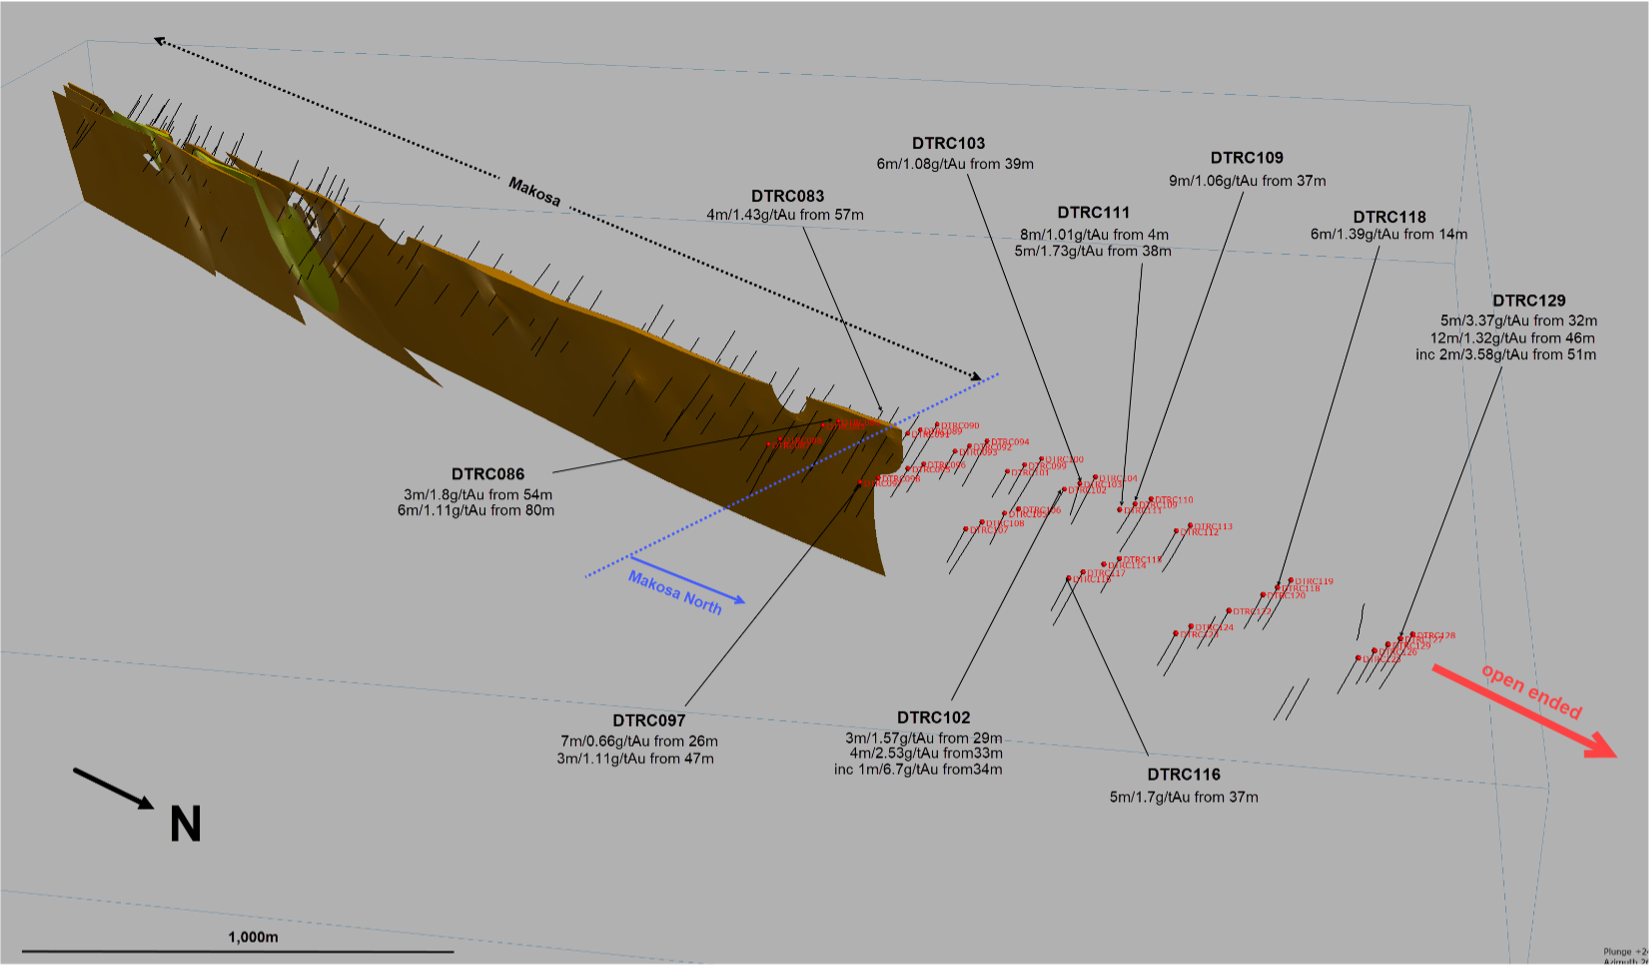 Figure 3 - 3D View of Makosa North